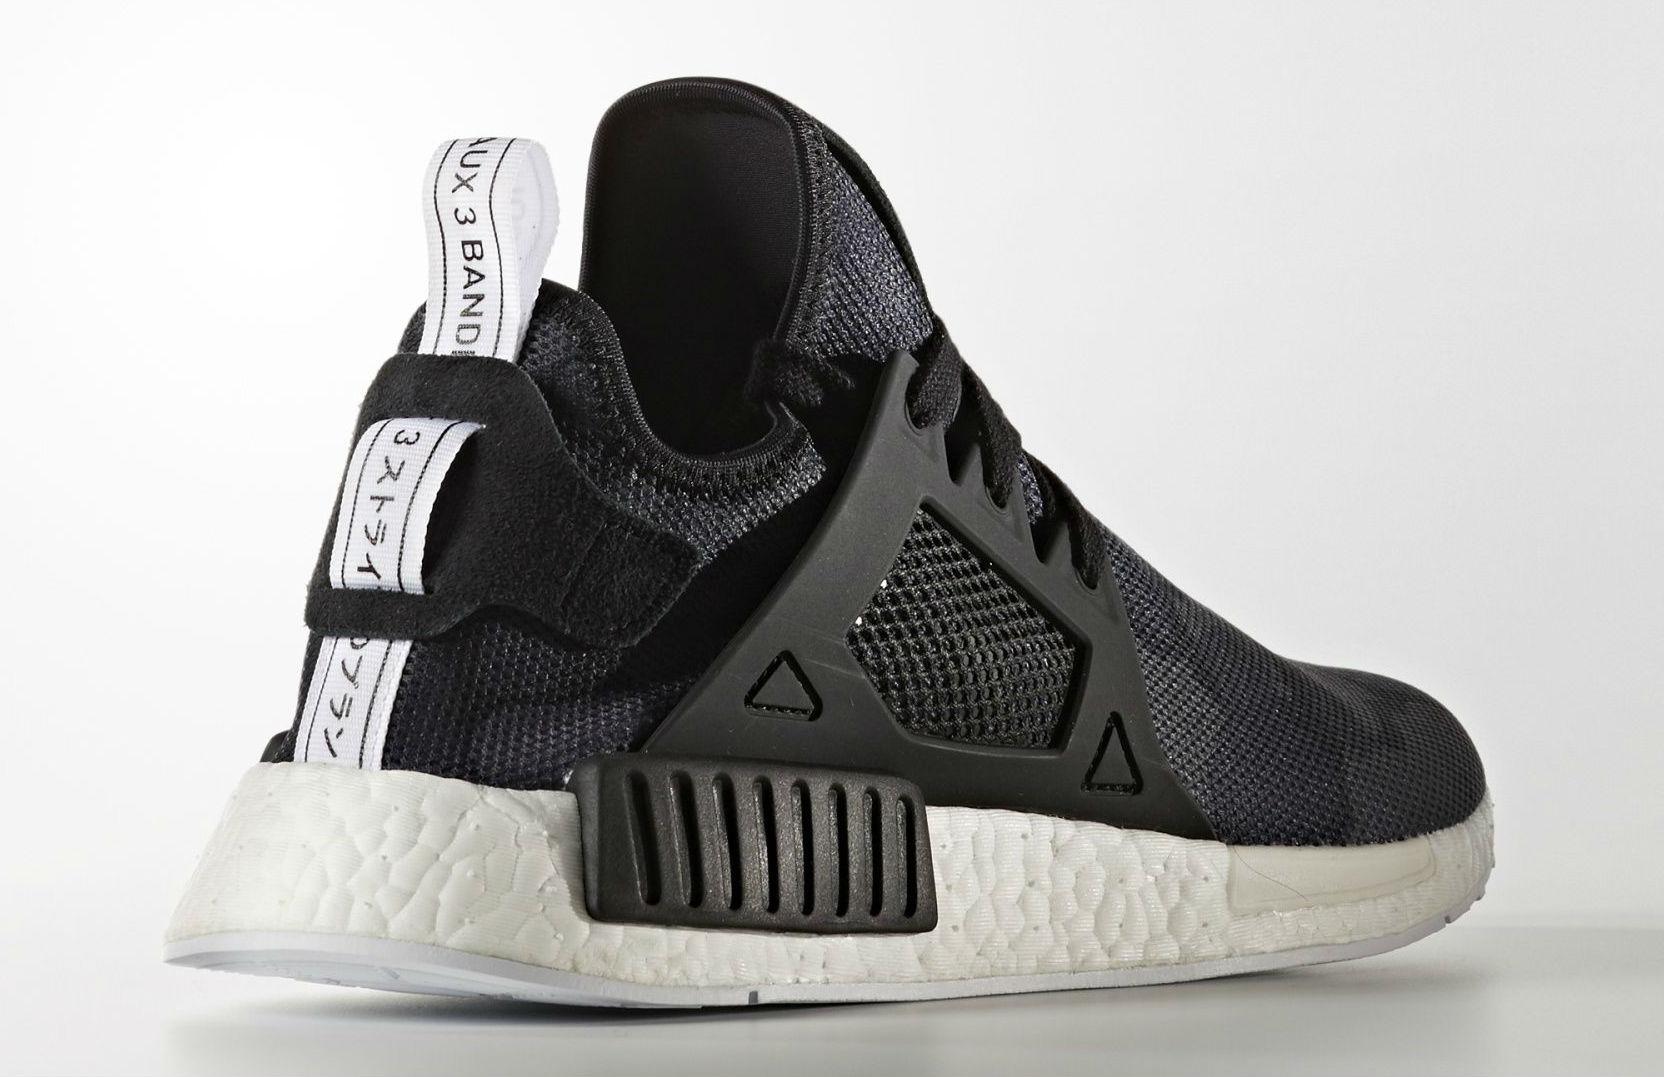 Adidas NMD XR1 Primeknit 'OG' Urban Necessities